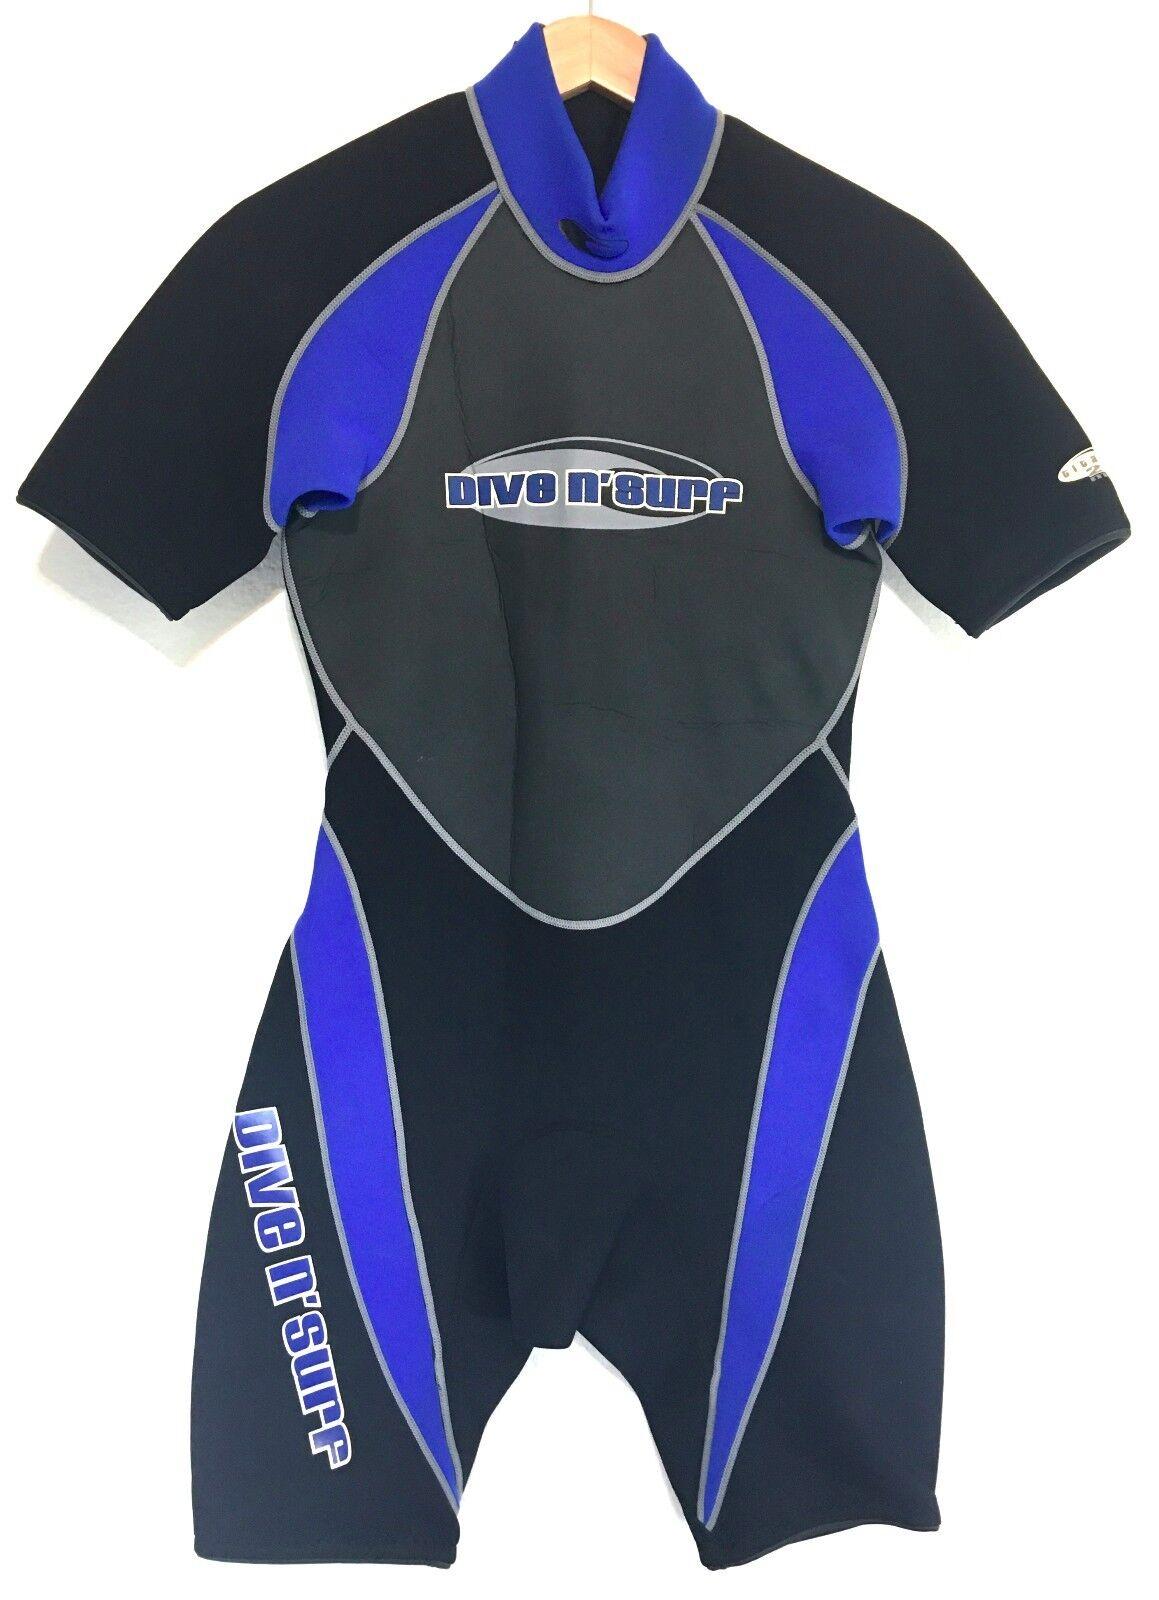 Dive N Surf Mens Spring Shorty Wetsuit Size Small S Titanium 2 2